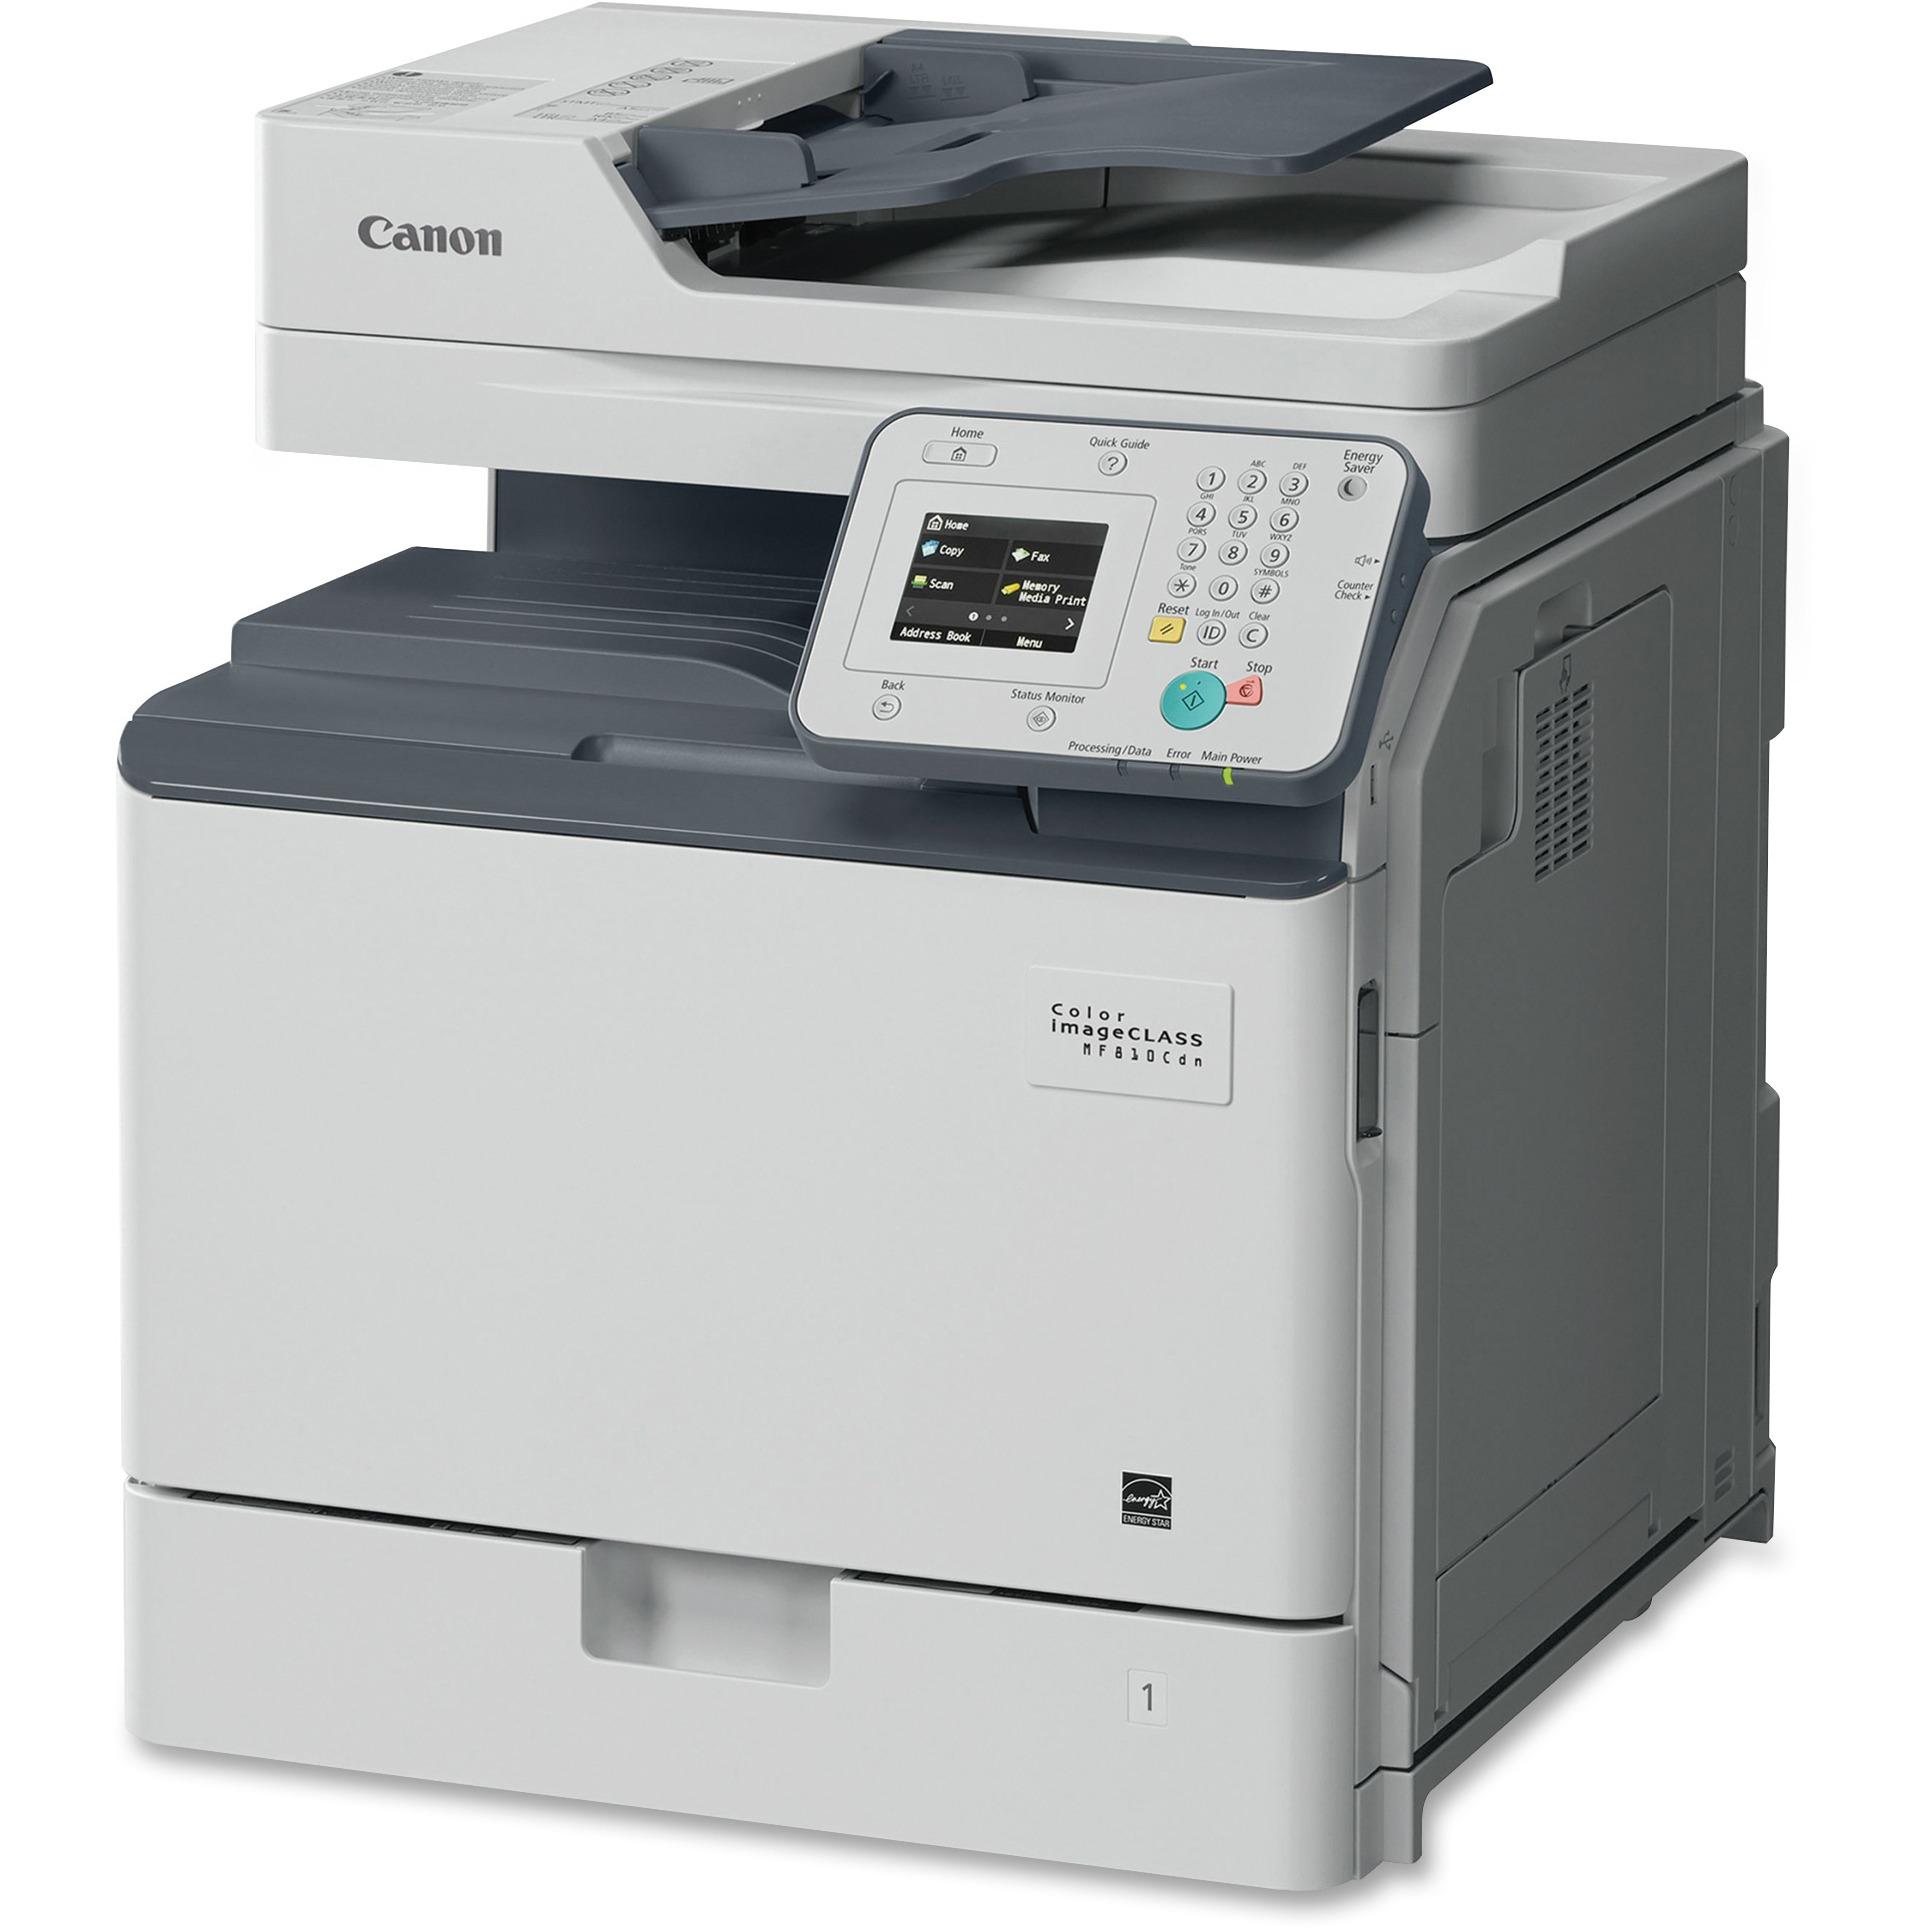 Canon Color imageCLASS MF810Cdn Multifunction Laser Printer, Copy/Fax/Print/Scan